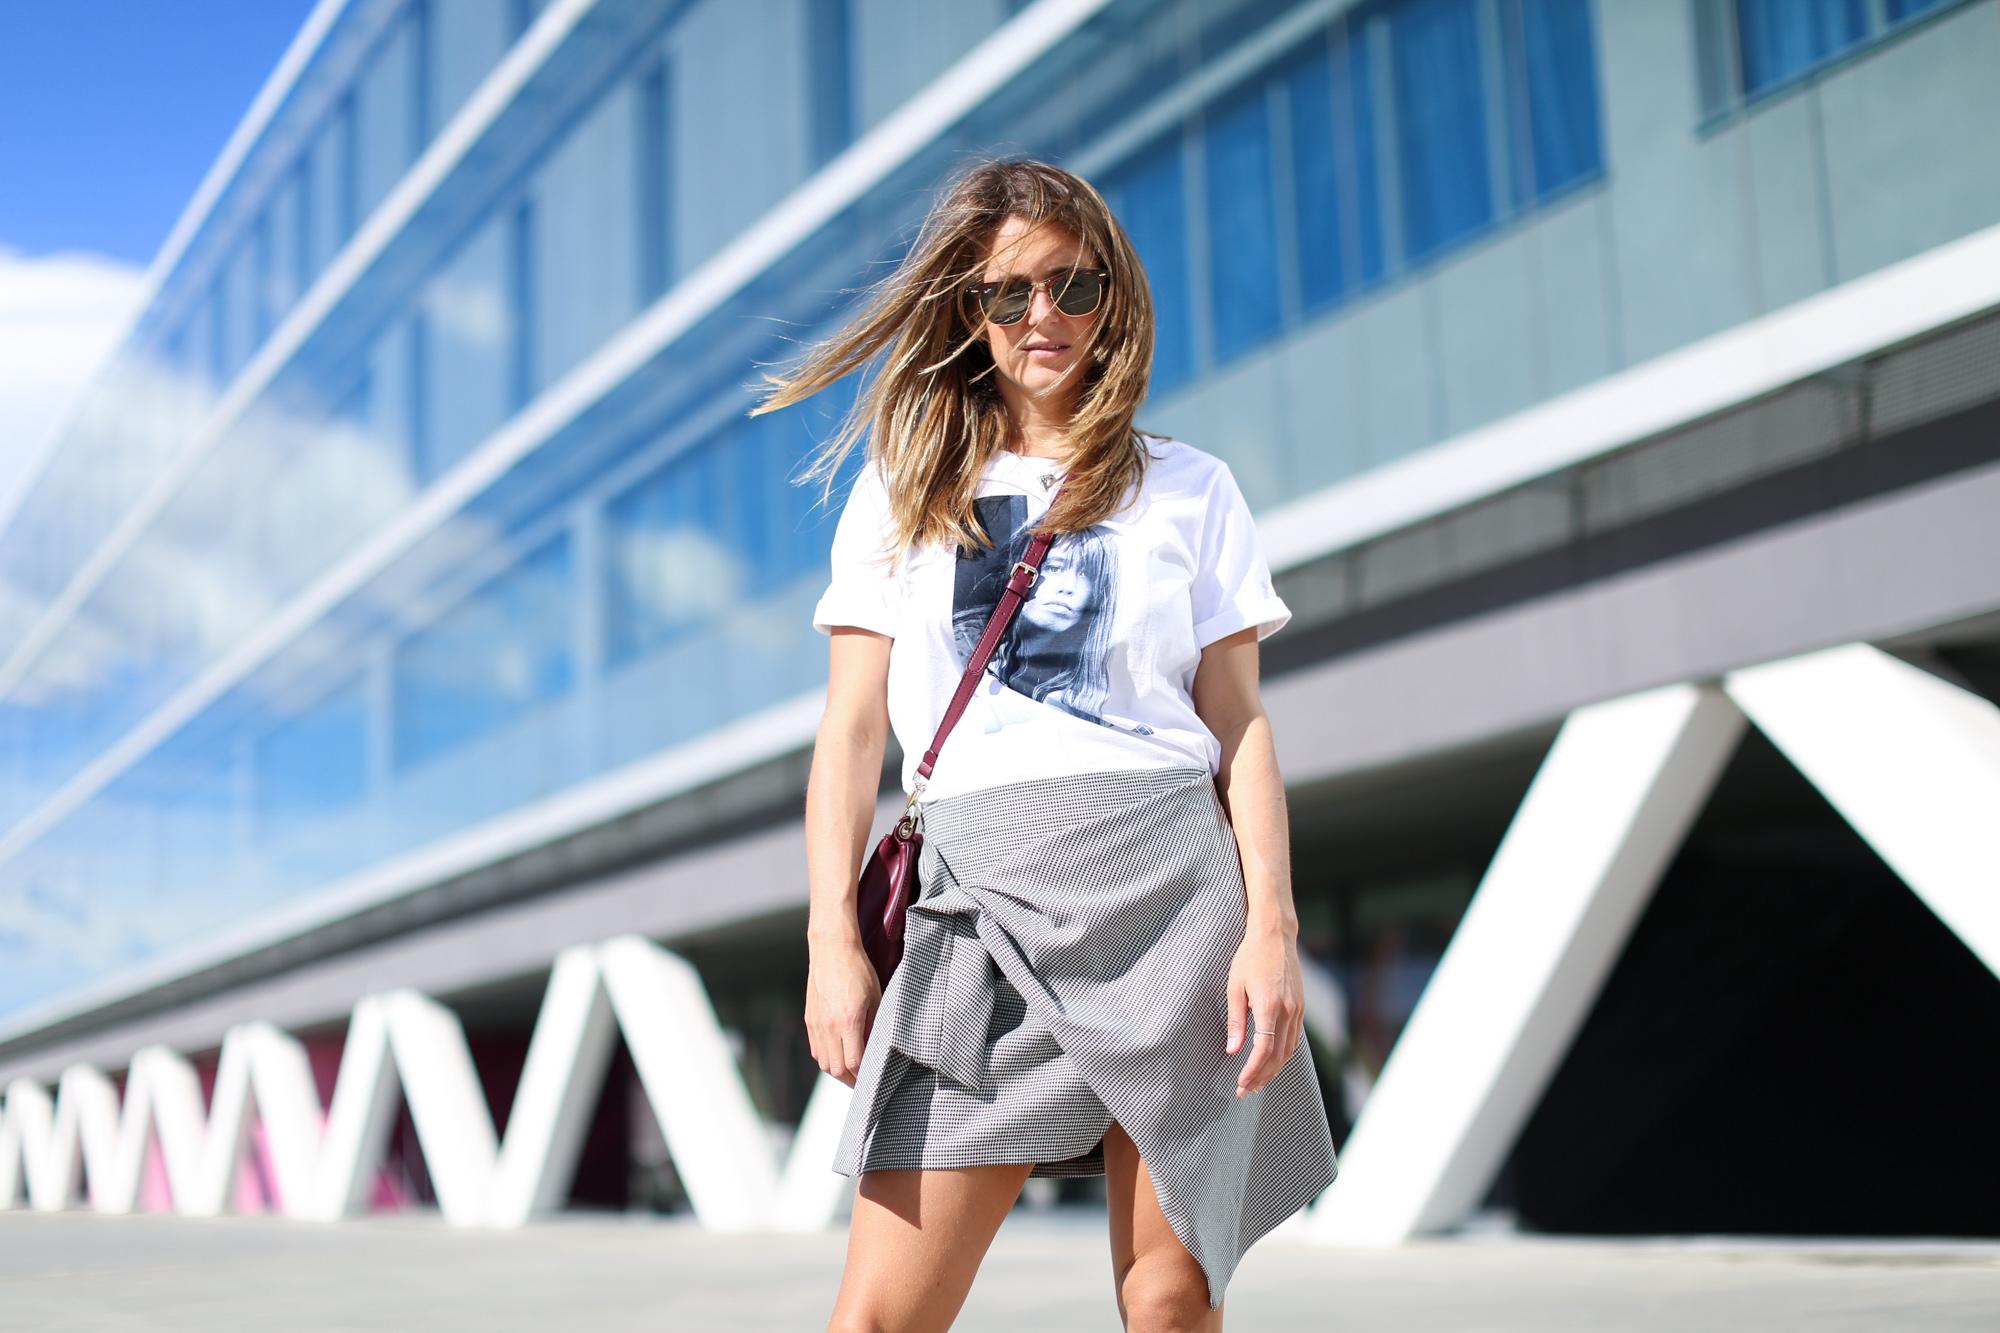 clochet_streetstyle_fashionblogger_leatherloafers_zara_asymmetric_toothgooseminiskirt-2